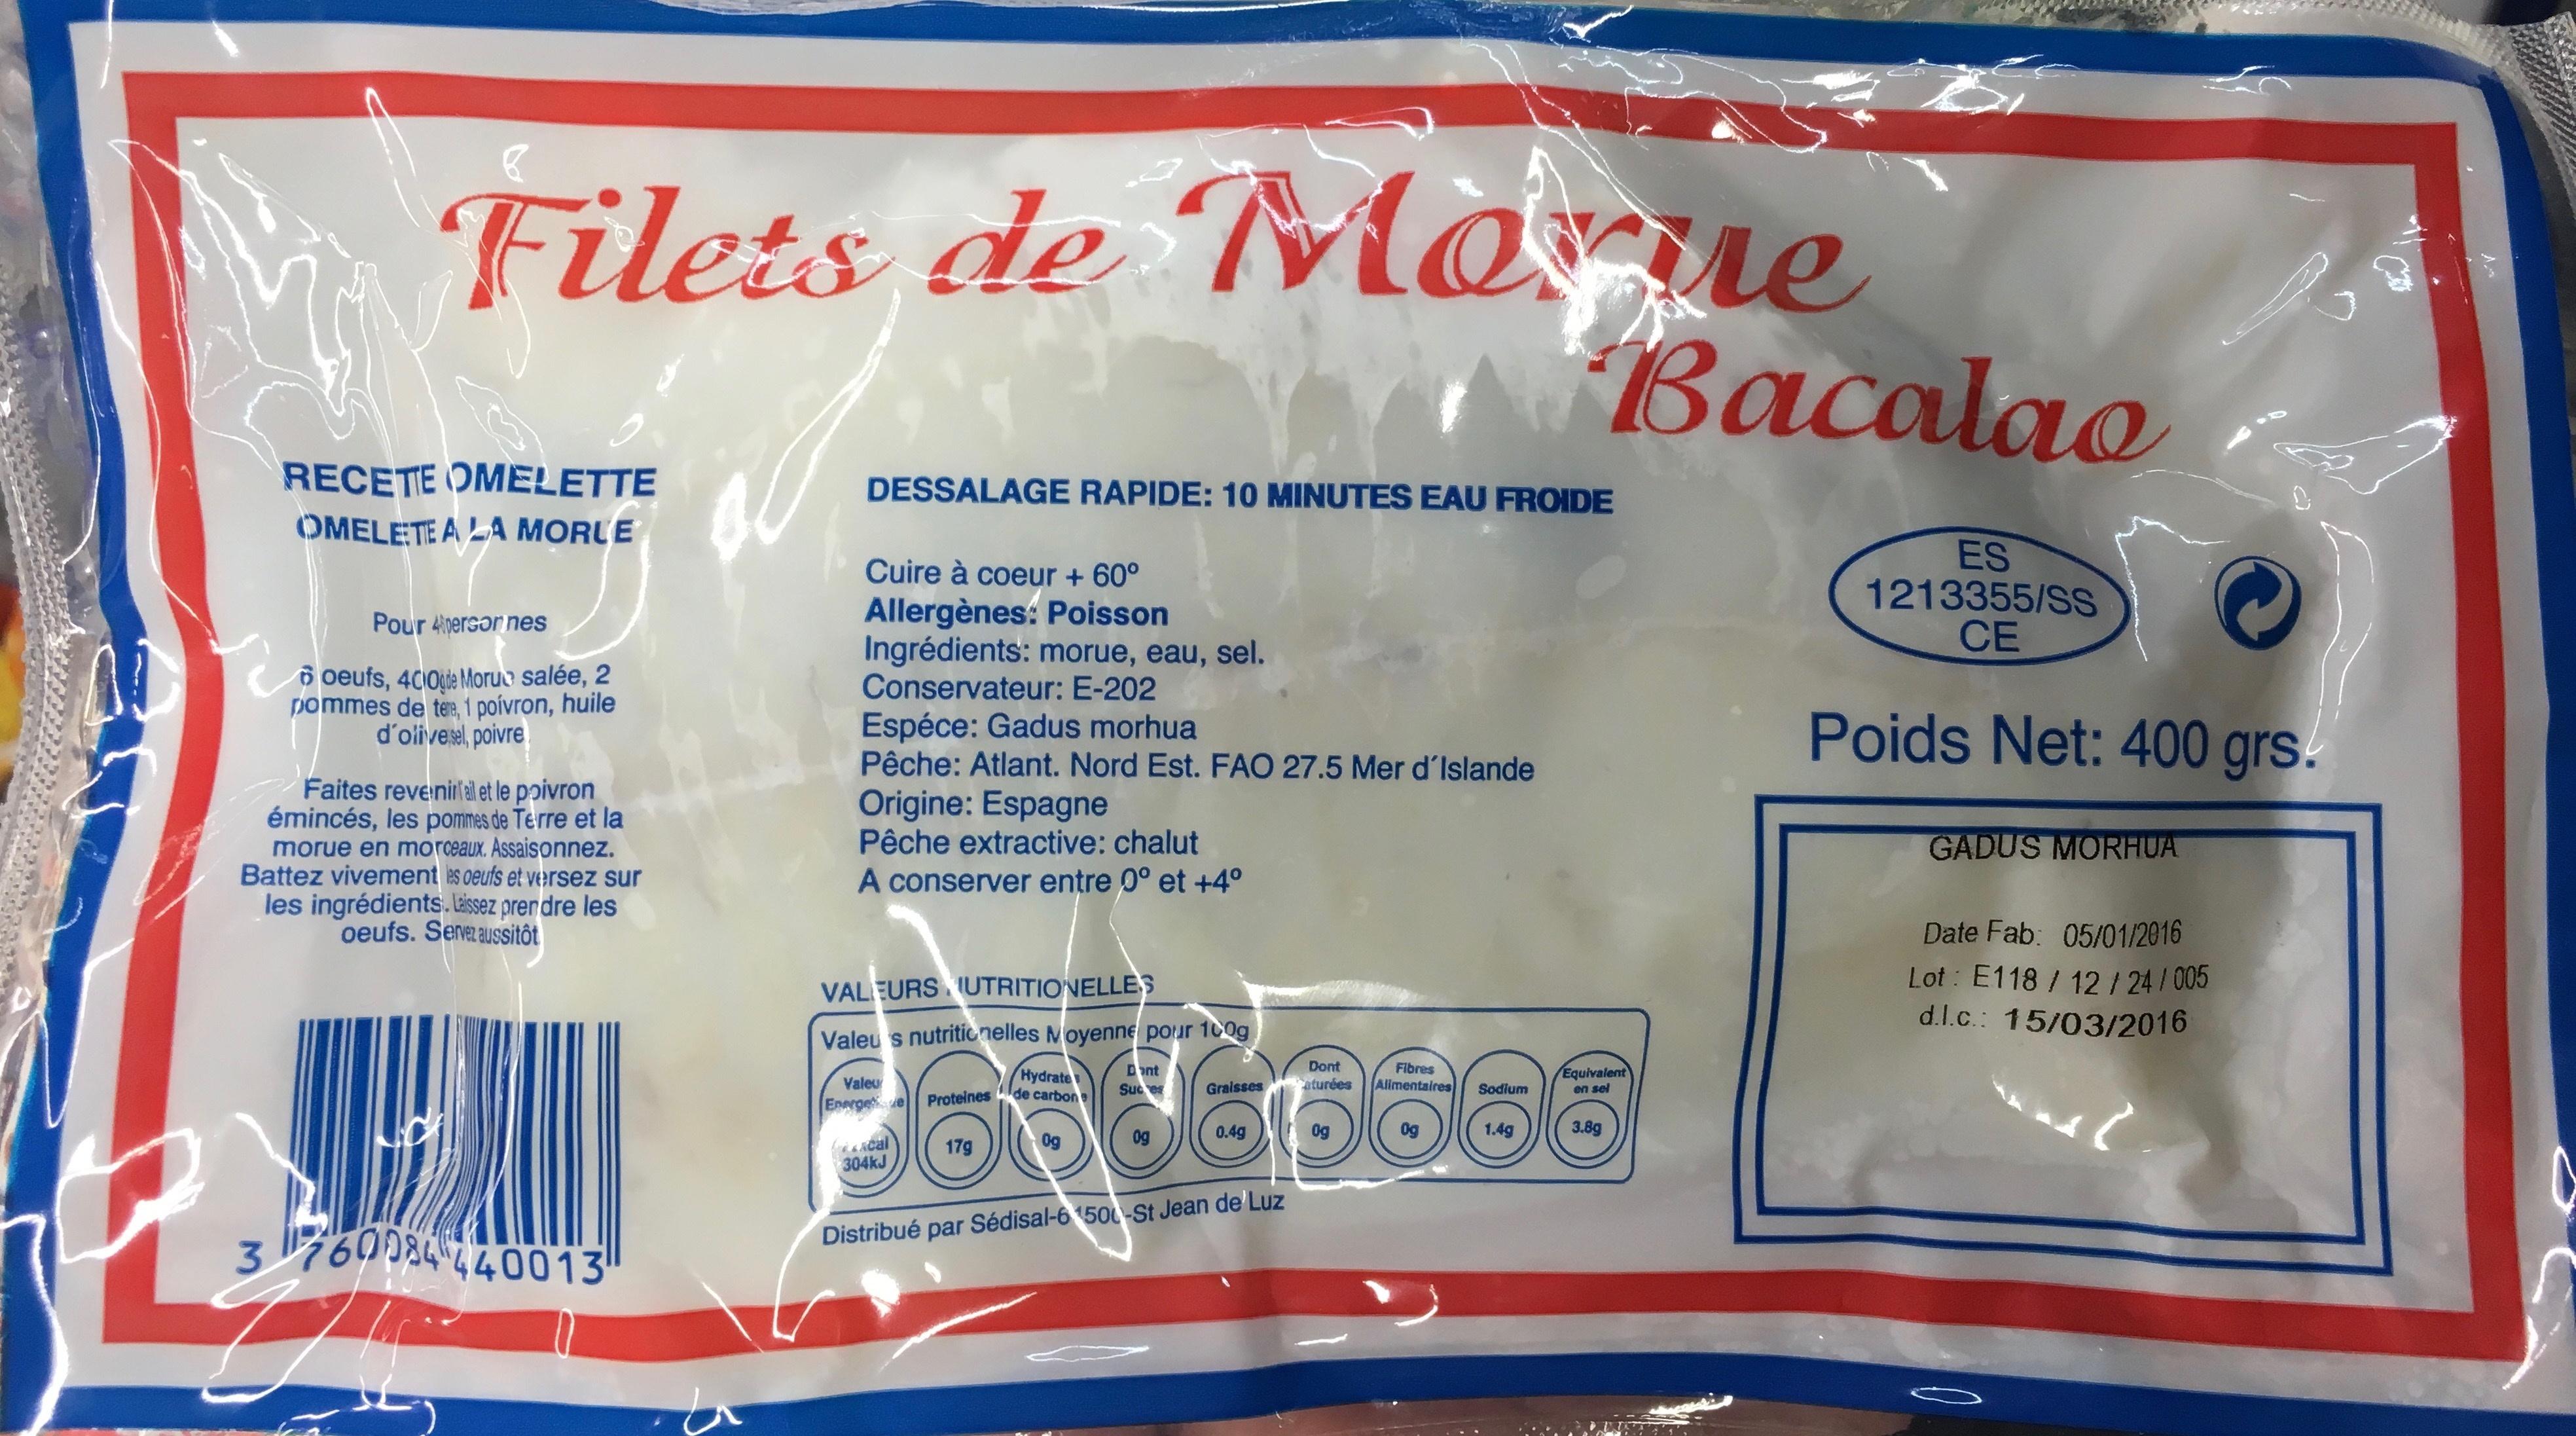 Filets de Morue Bacalao - Produit